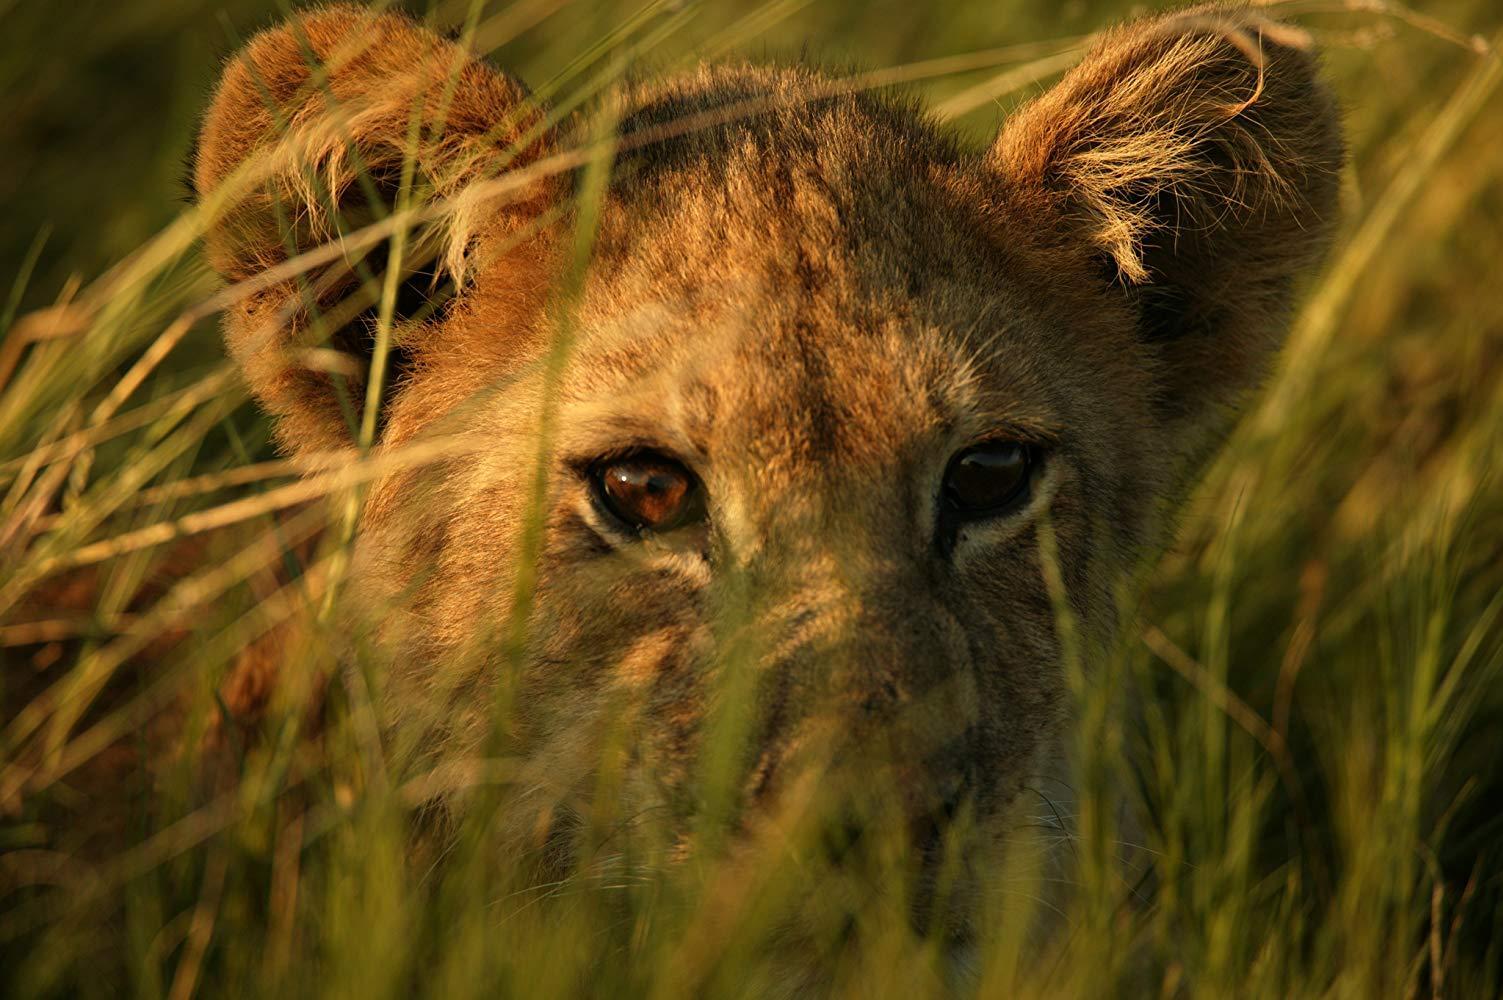 مشاهدة فيلم The Last Lions 2011 HD مترجم كامل اون لاين